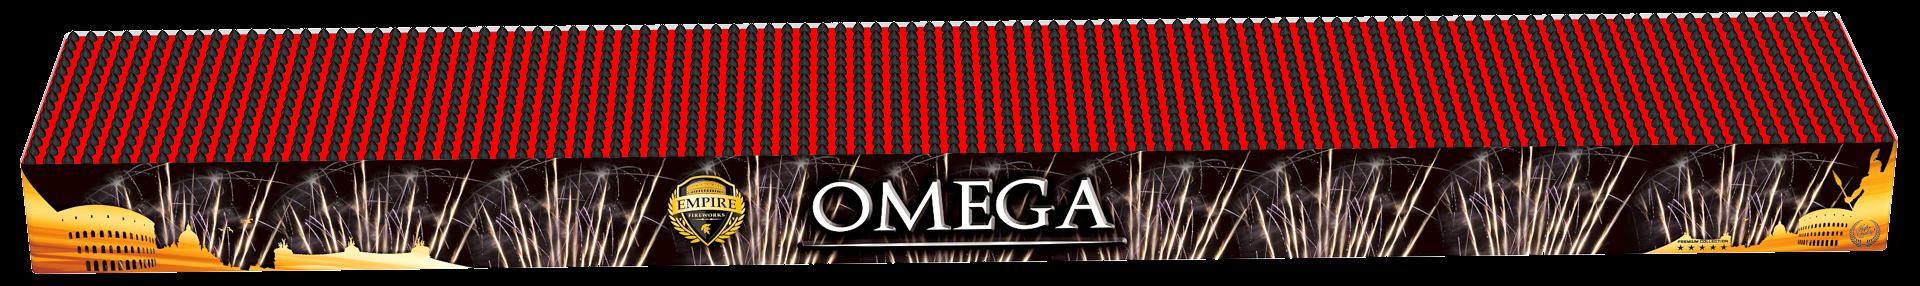 Omega (1500 schots fluitcake)